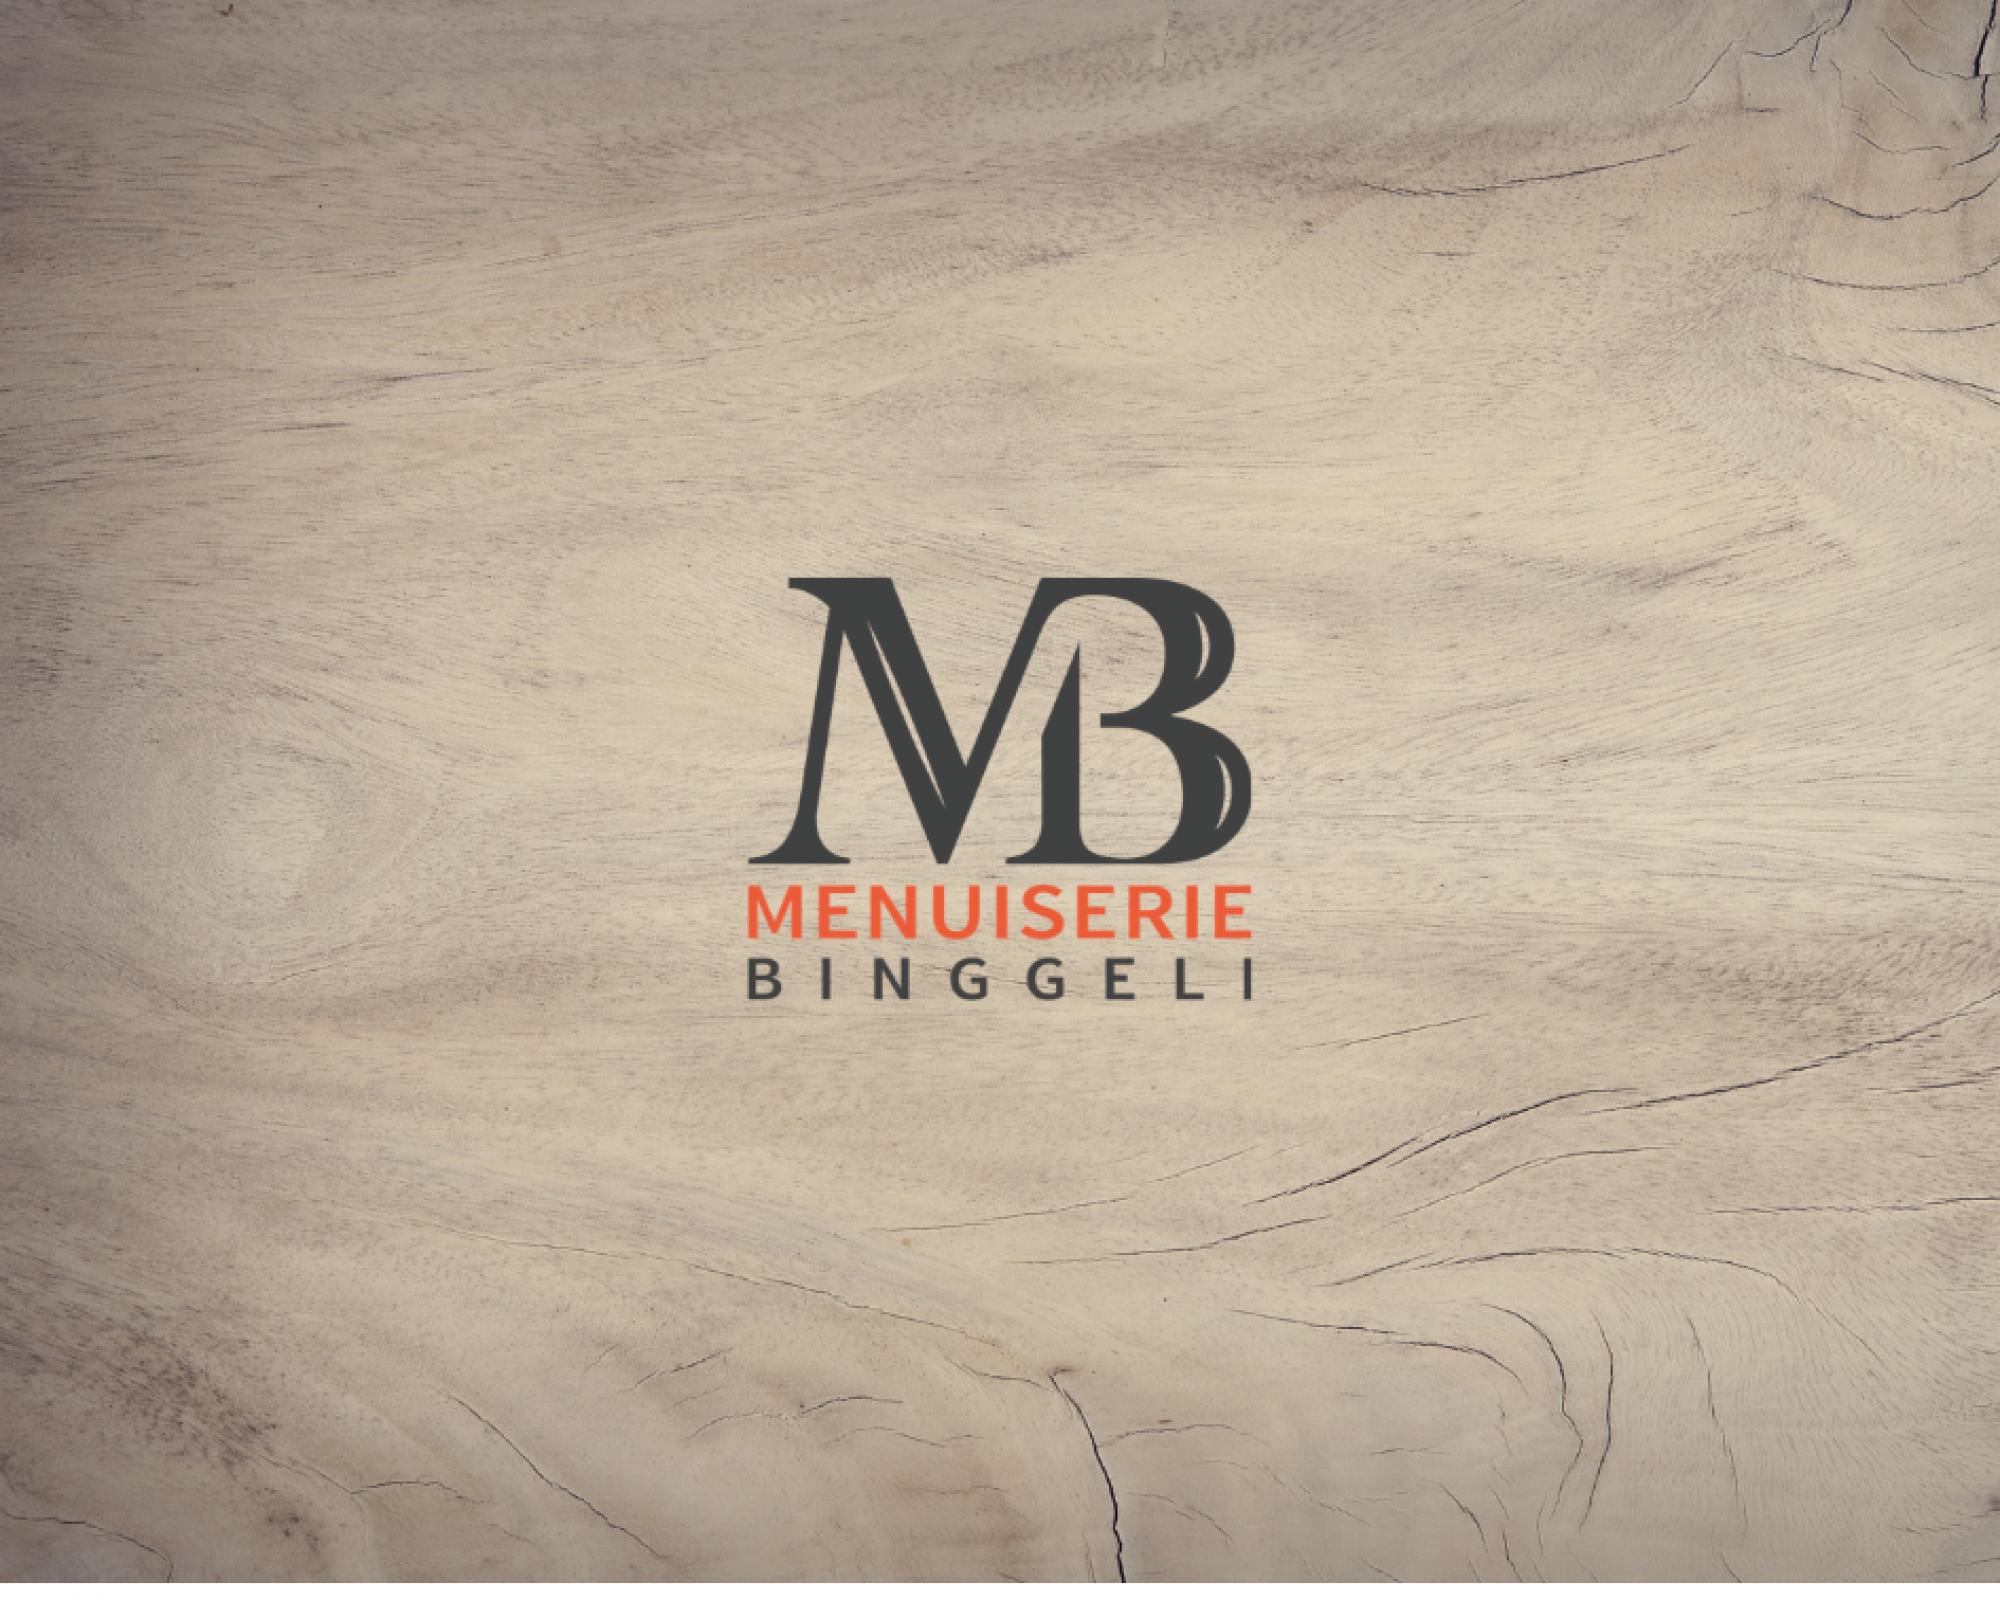 Menuiserie Binggeli